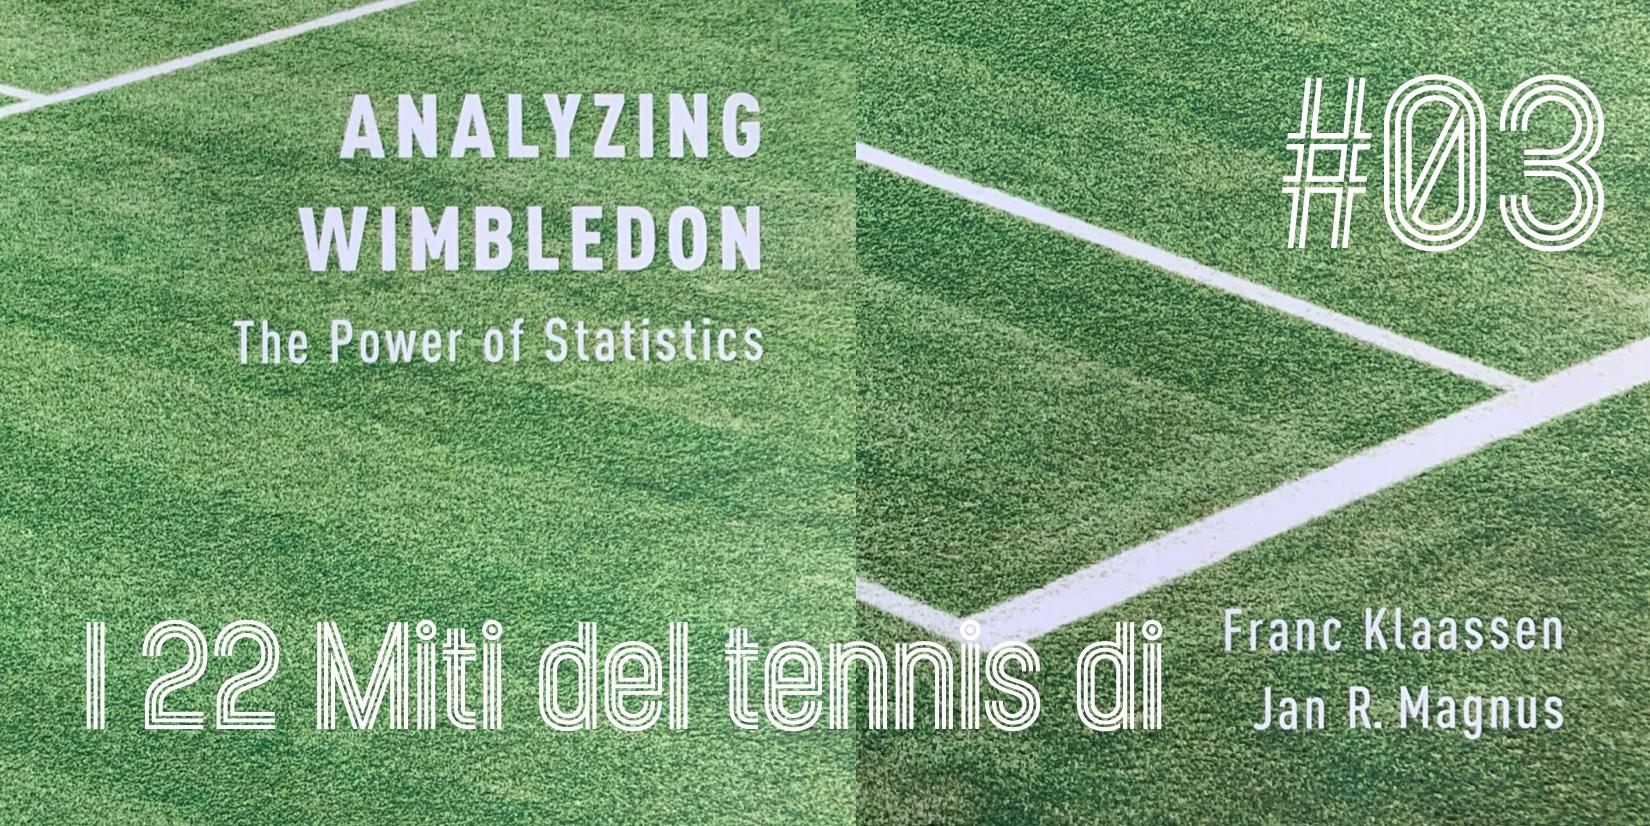 I 22 miti del tennis di Klaassen & Magnus – Mito 3 - settesei.it